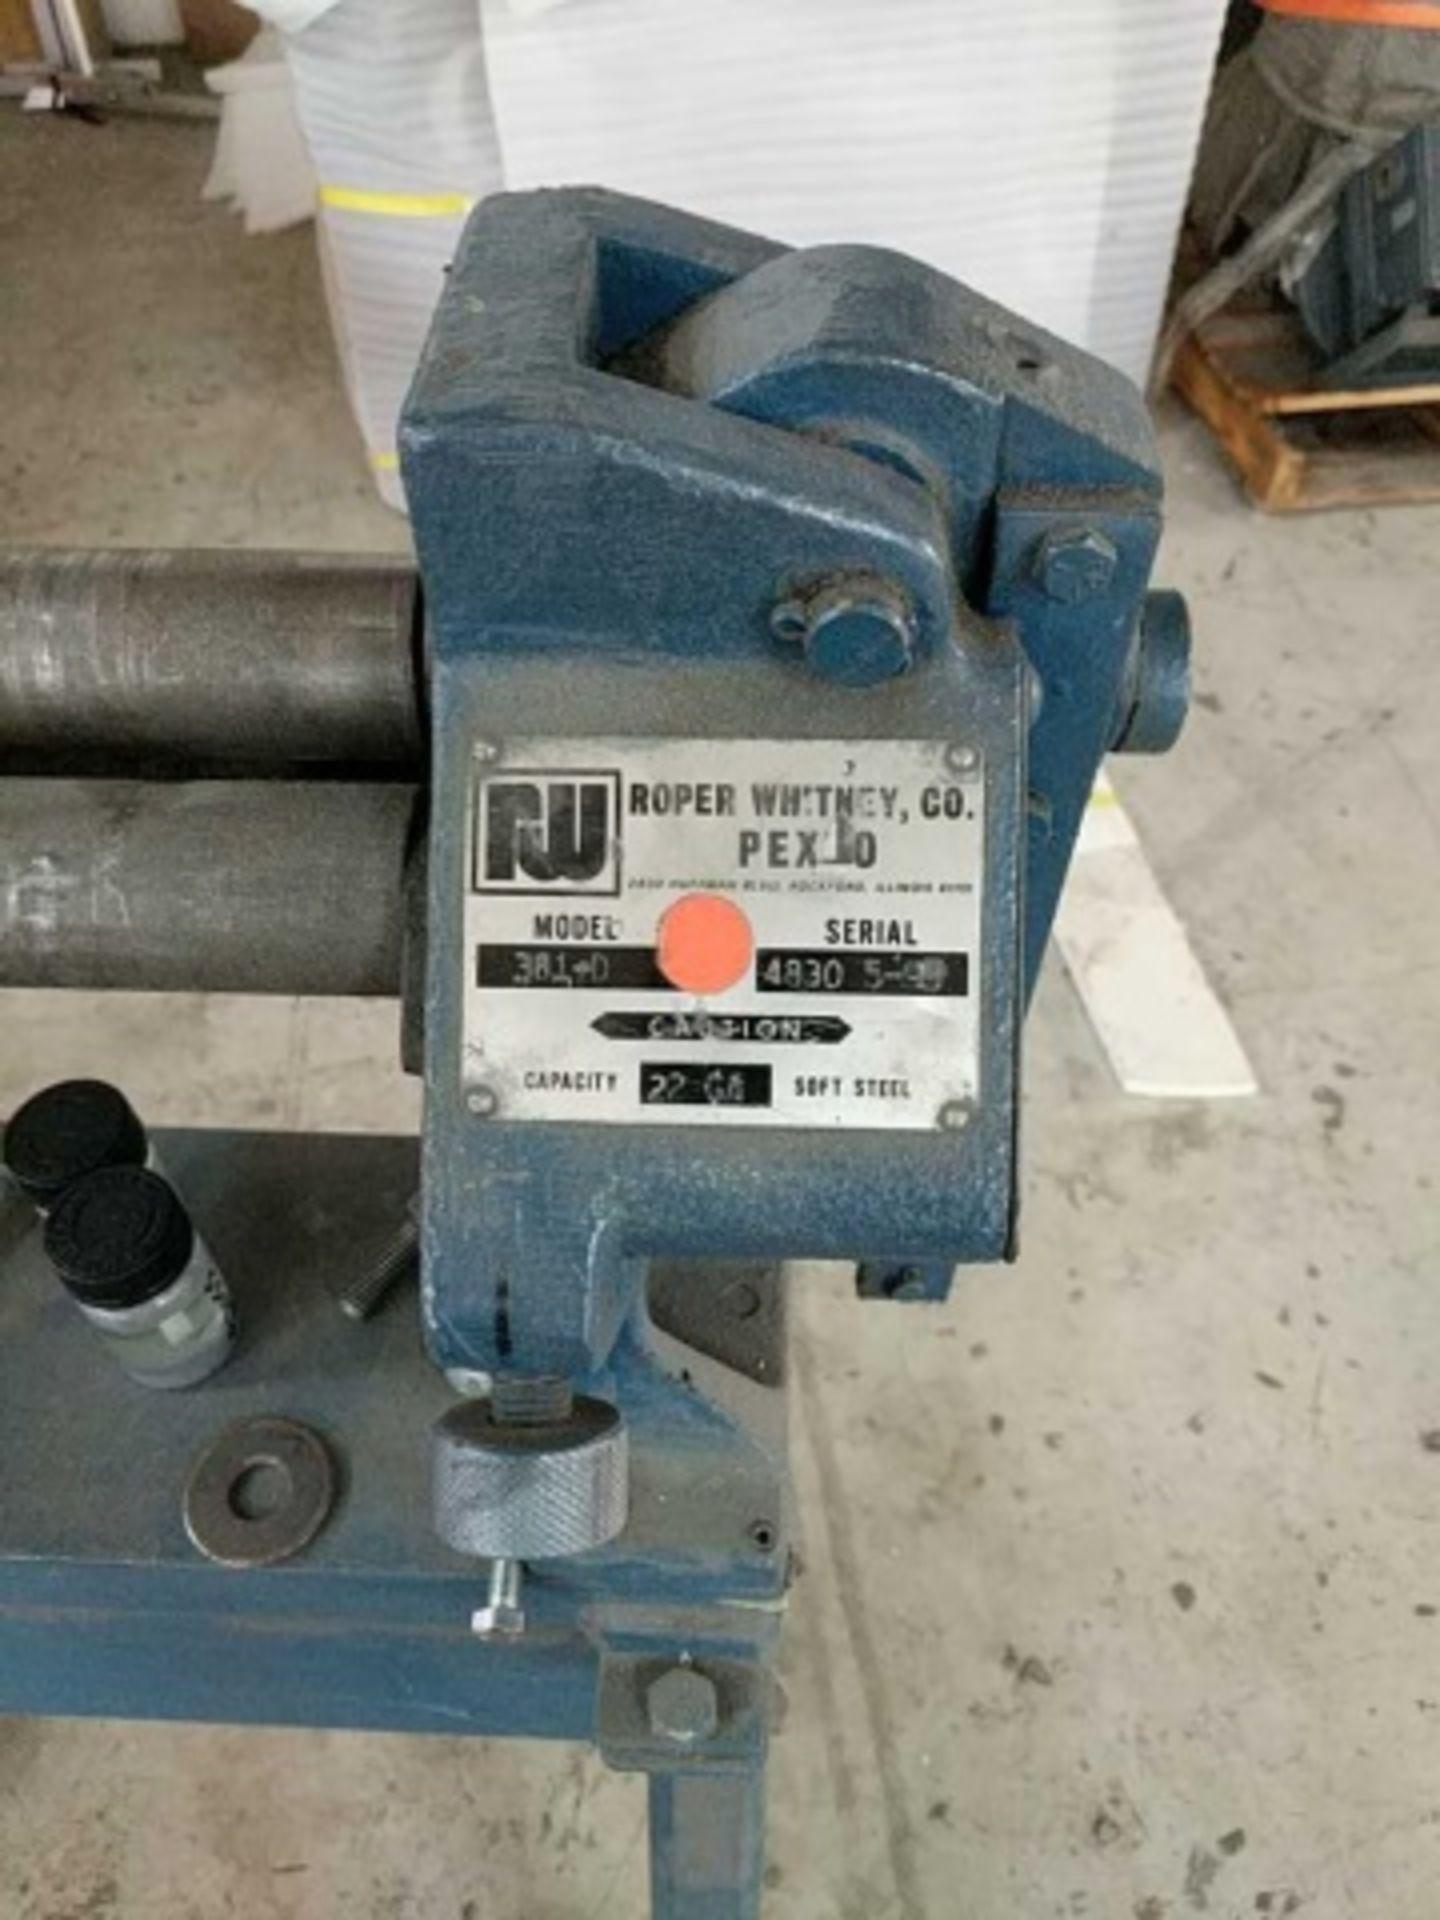 Pexto 381-D Bench Slip Roll Machine - Image 2 of 4